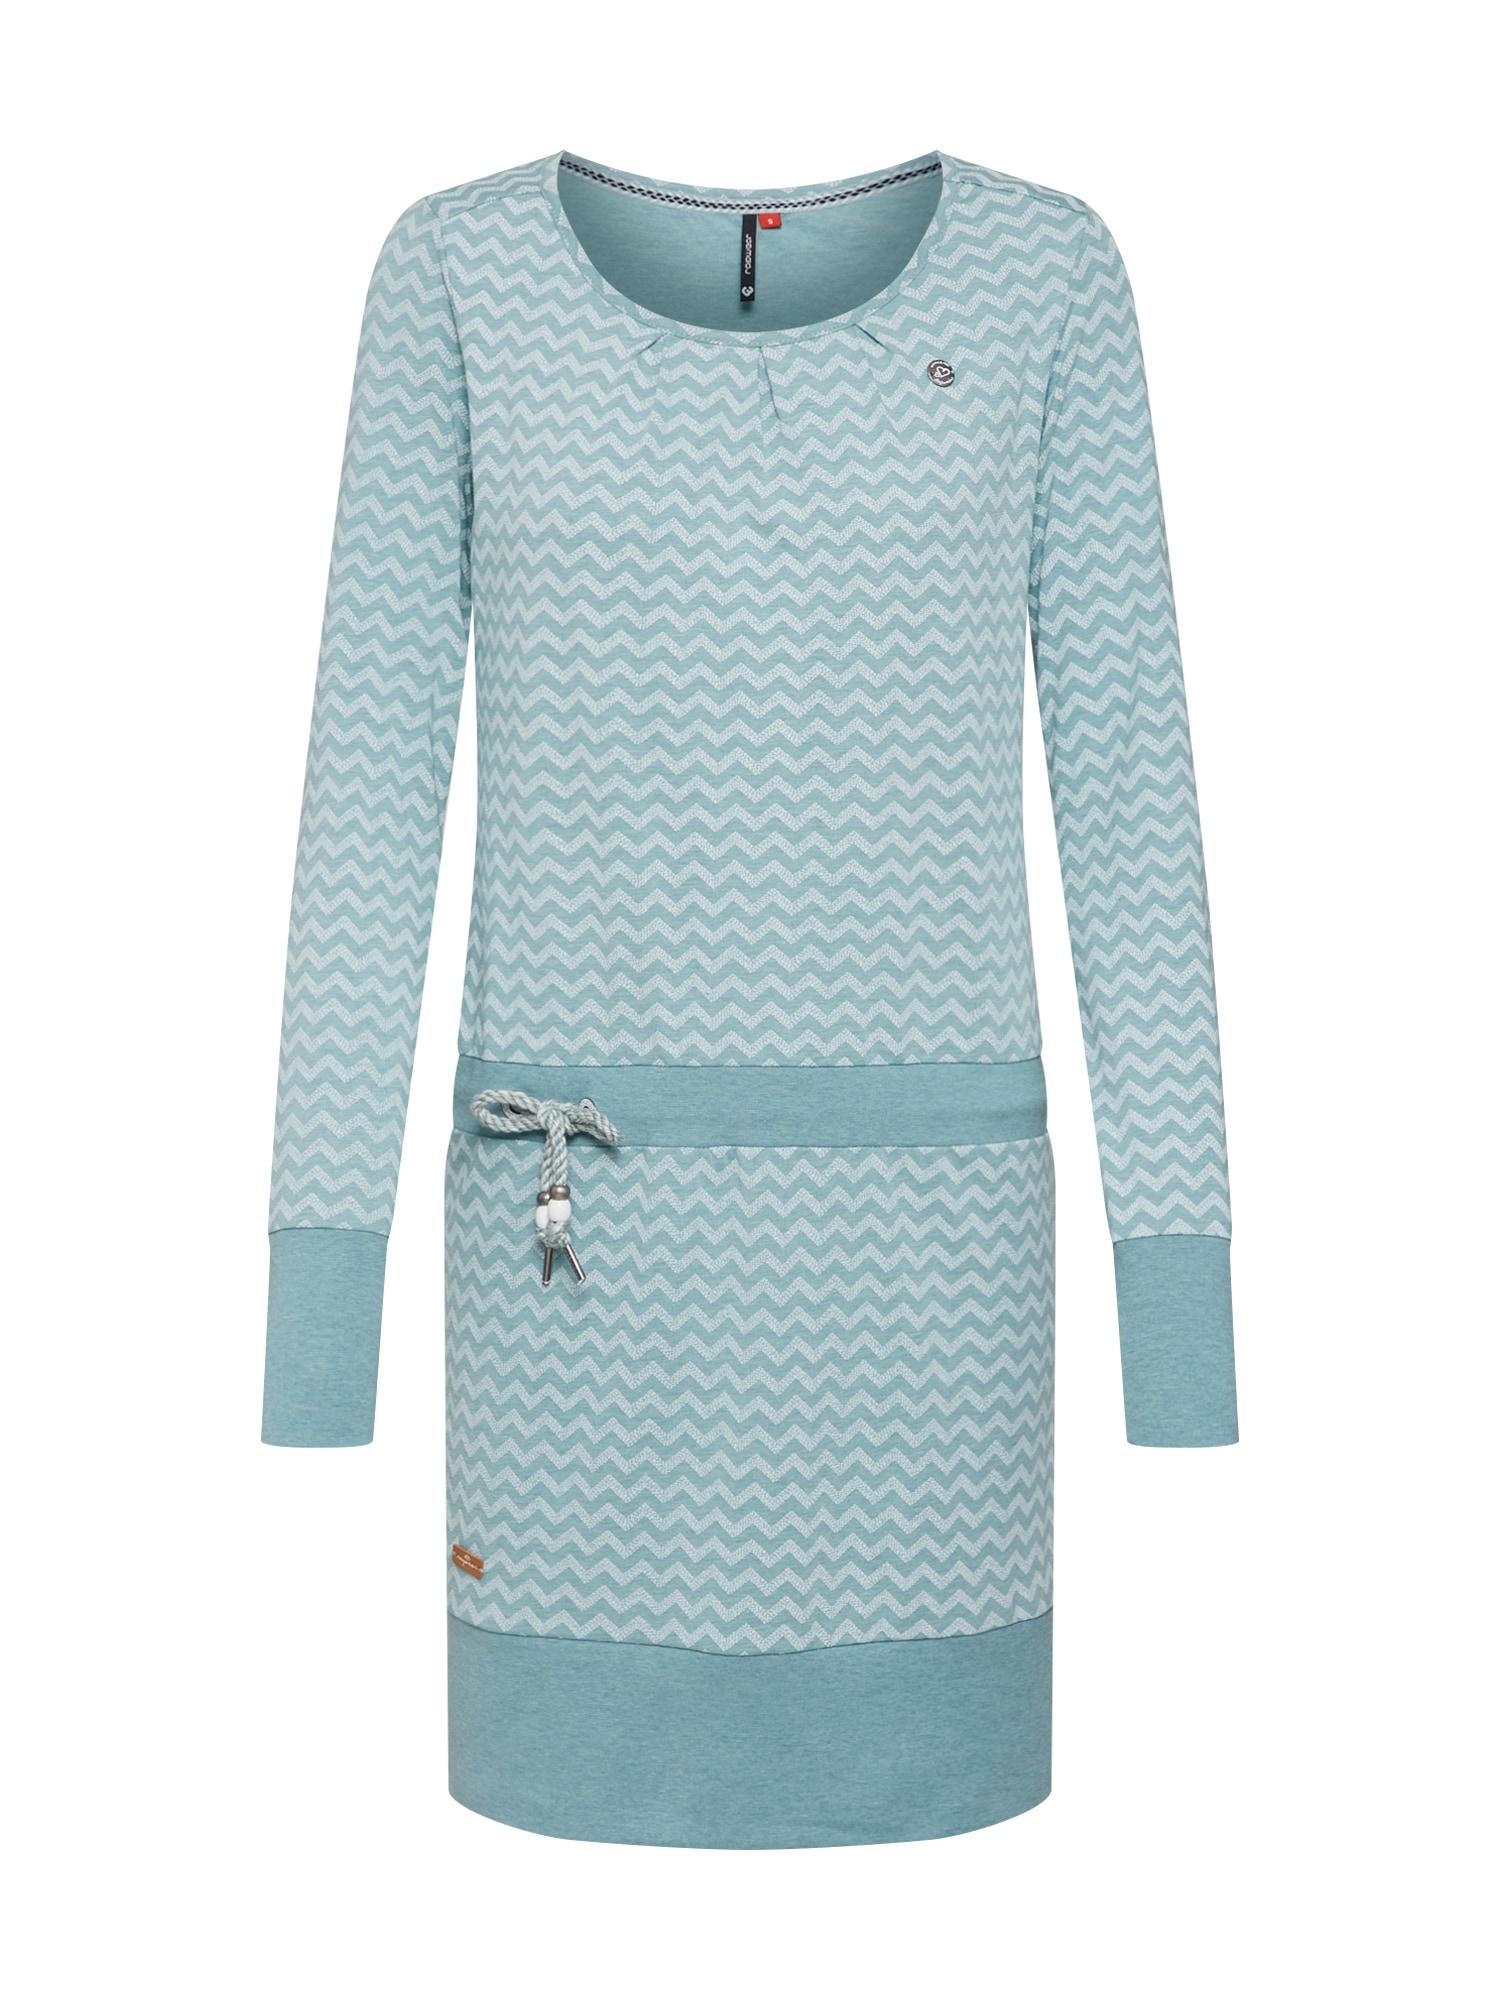 Šaty Alexa Zig Zag světlemodrá Ragwear